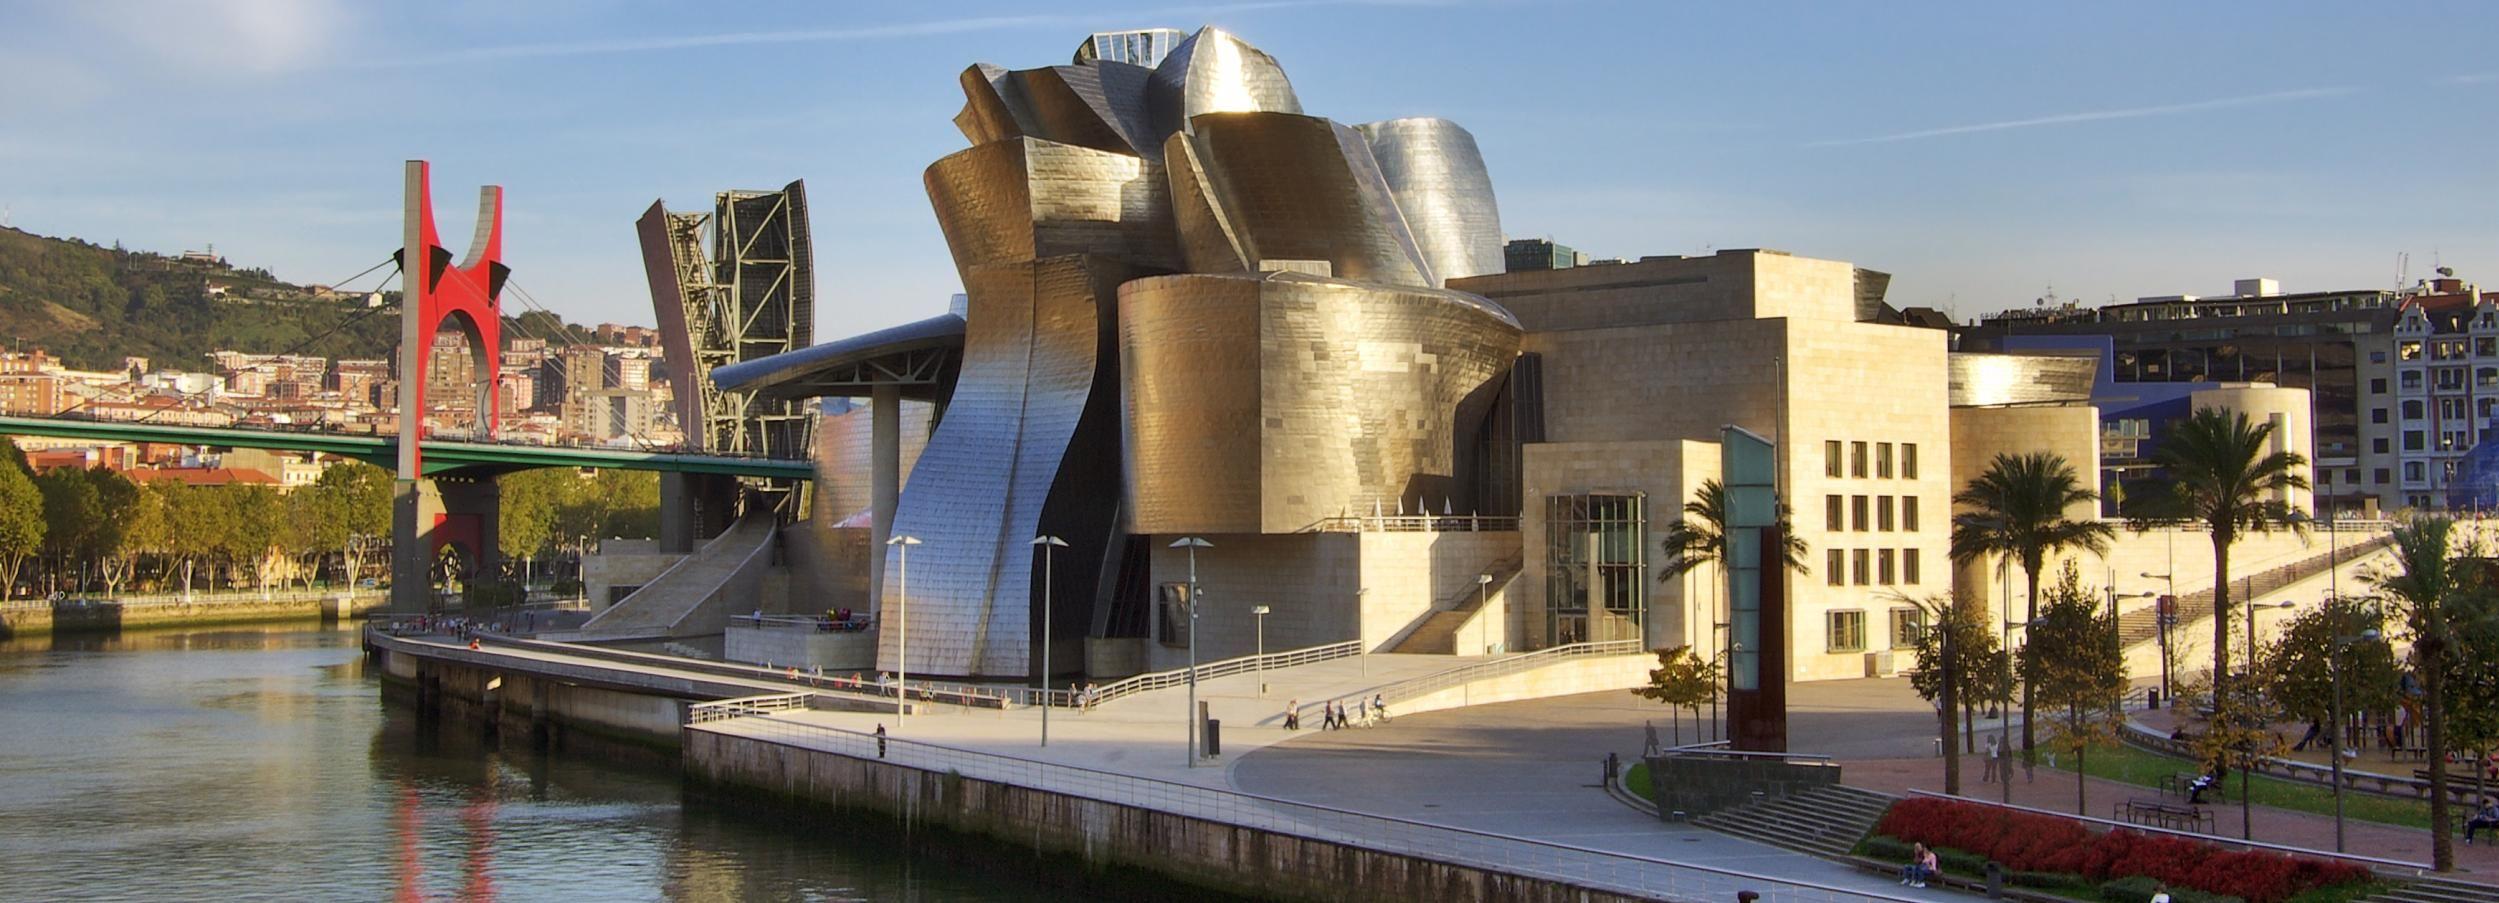 Bilbao: recorrido a pie guiado clásico y moderno con Pintxos